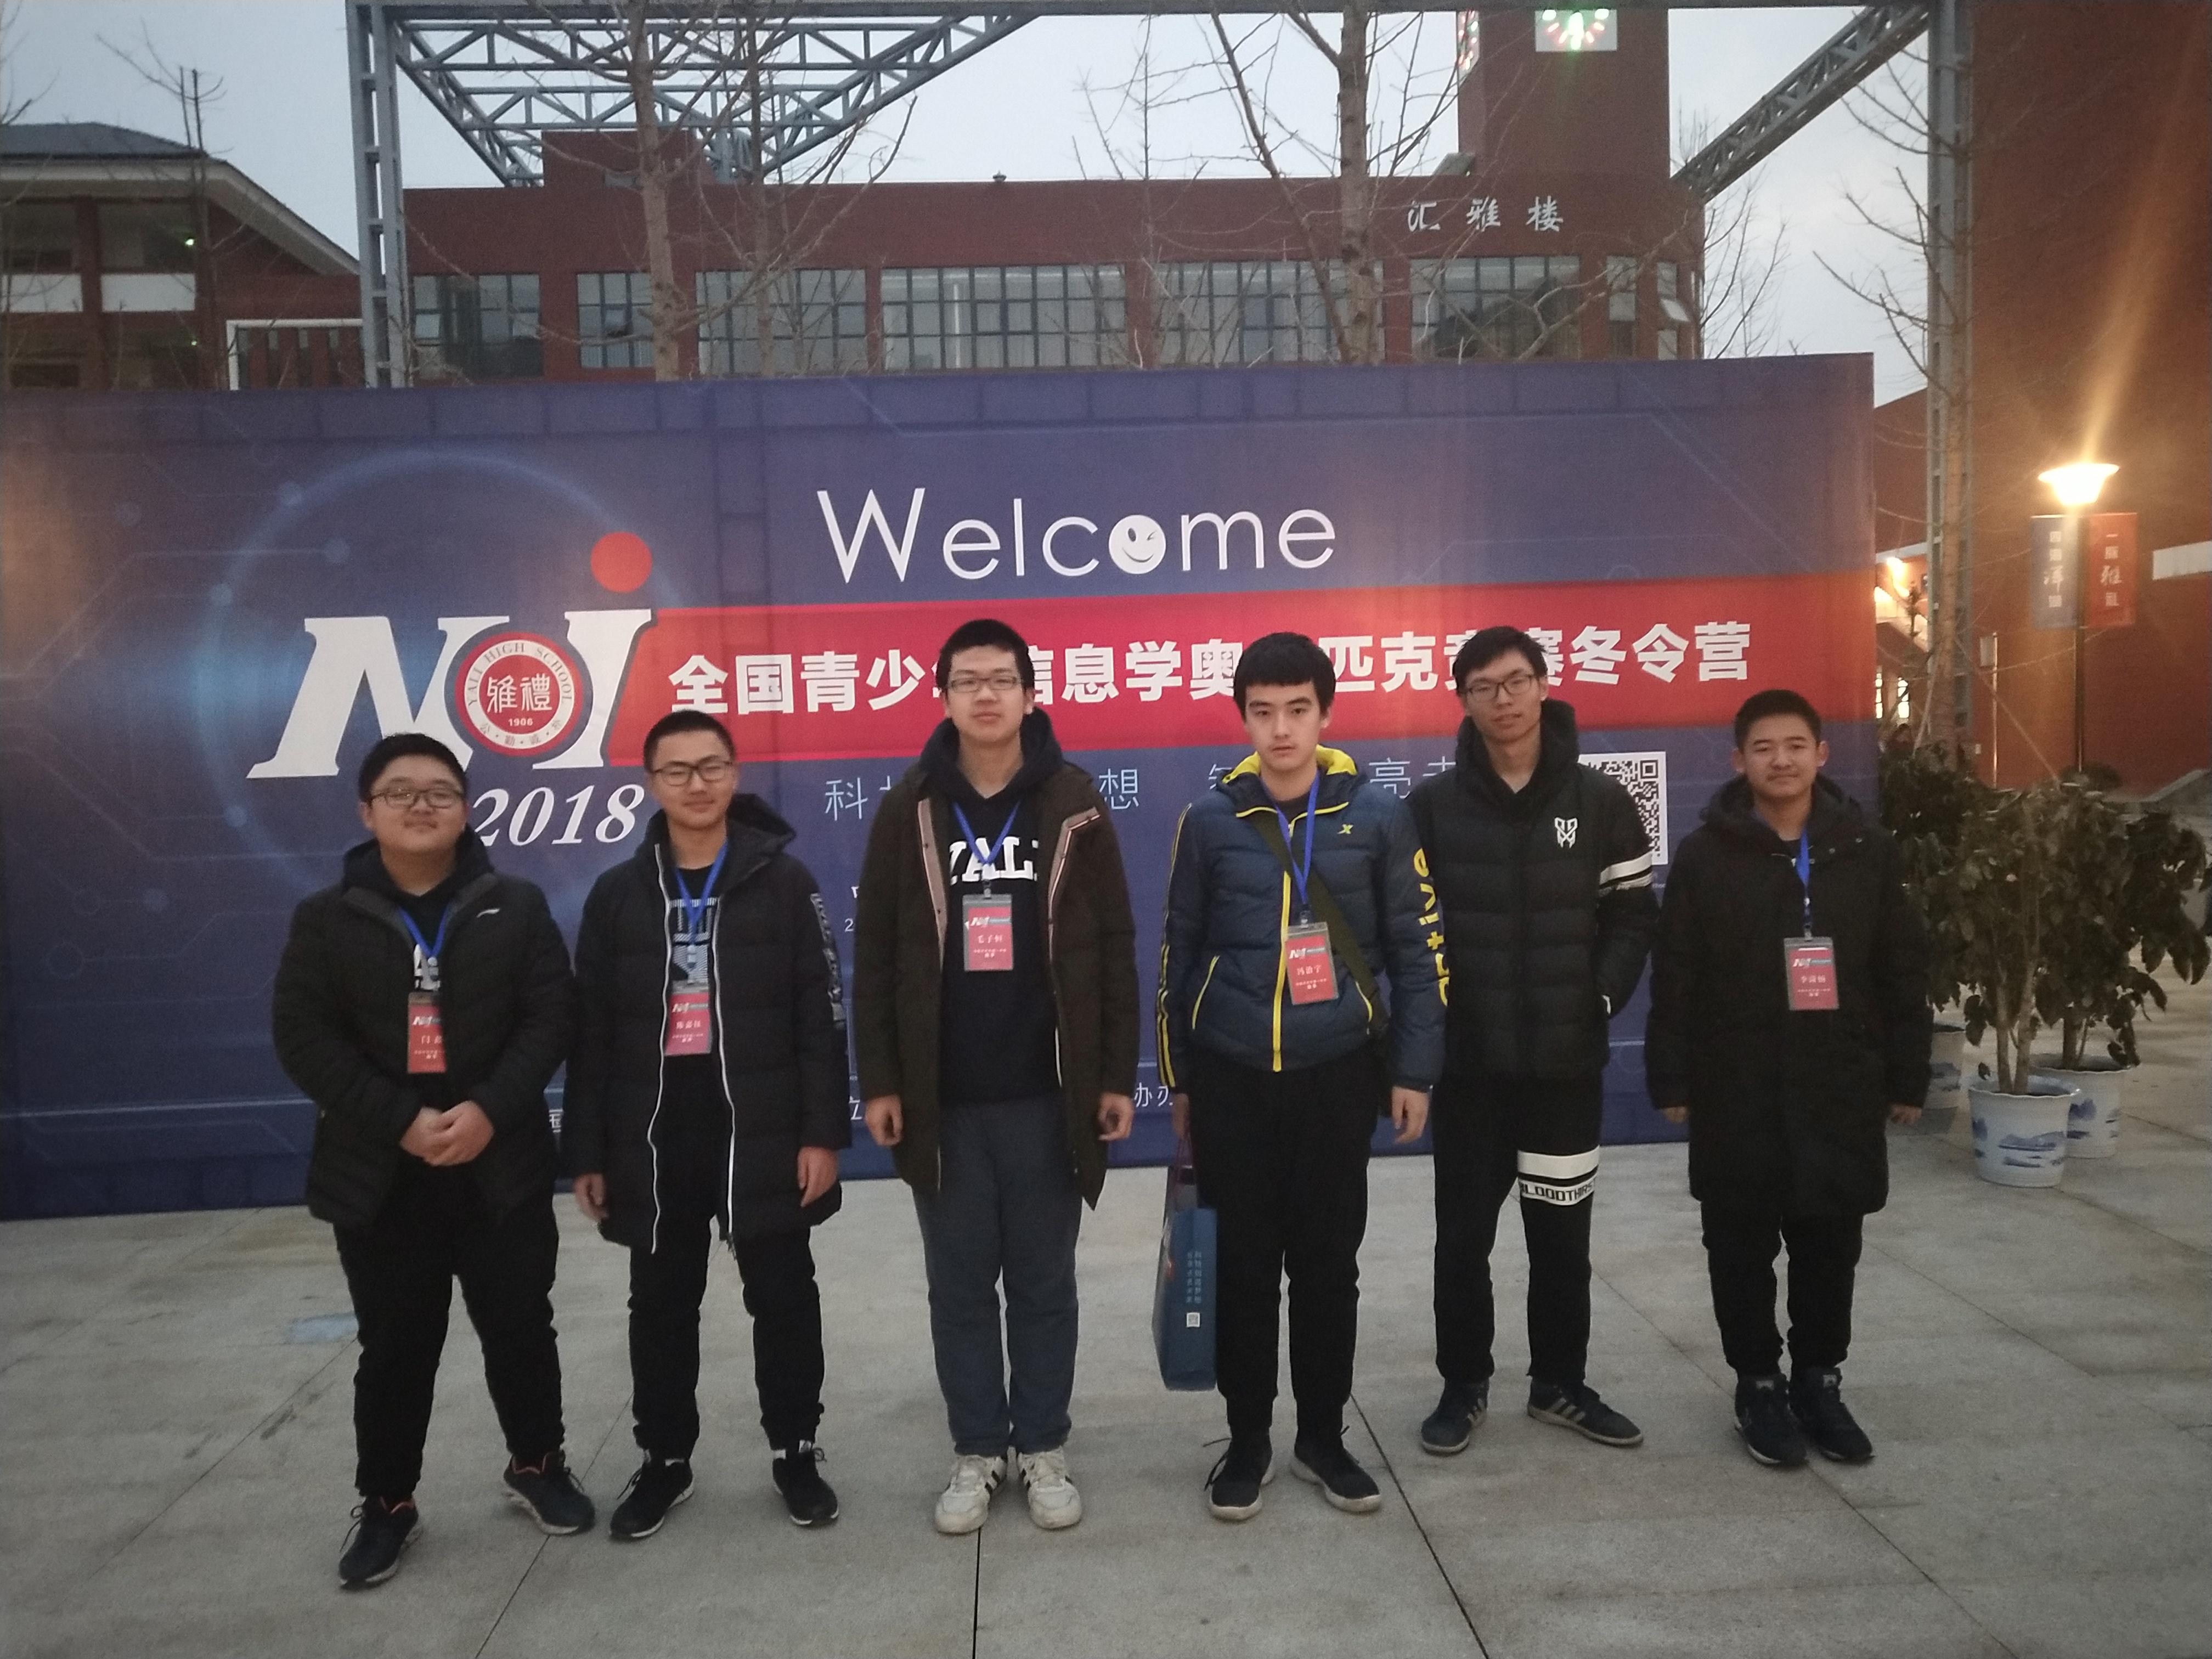 NOIWC2018一中参赛队员合影